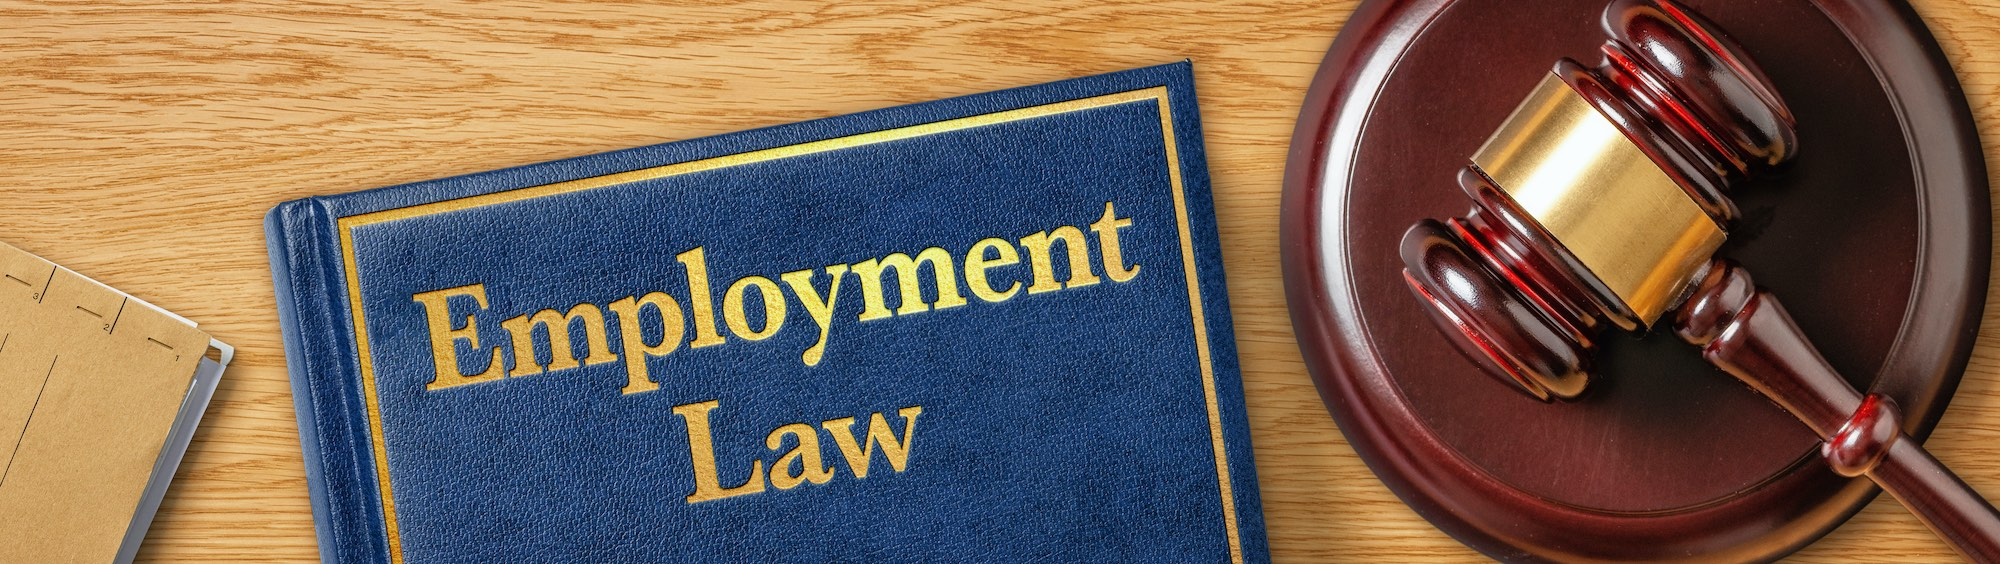 Employment Law Resource